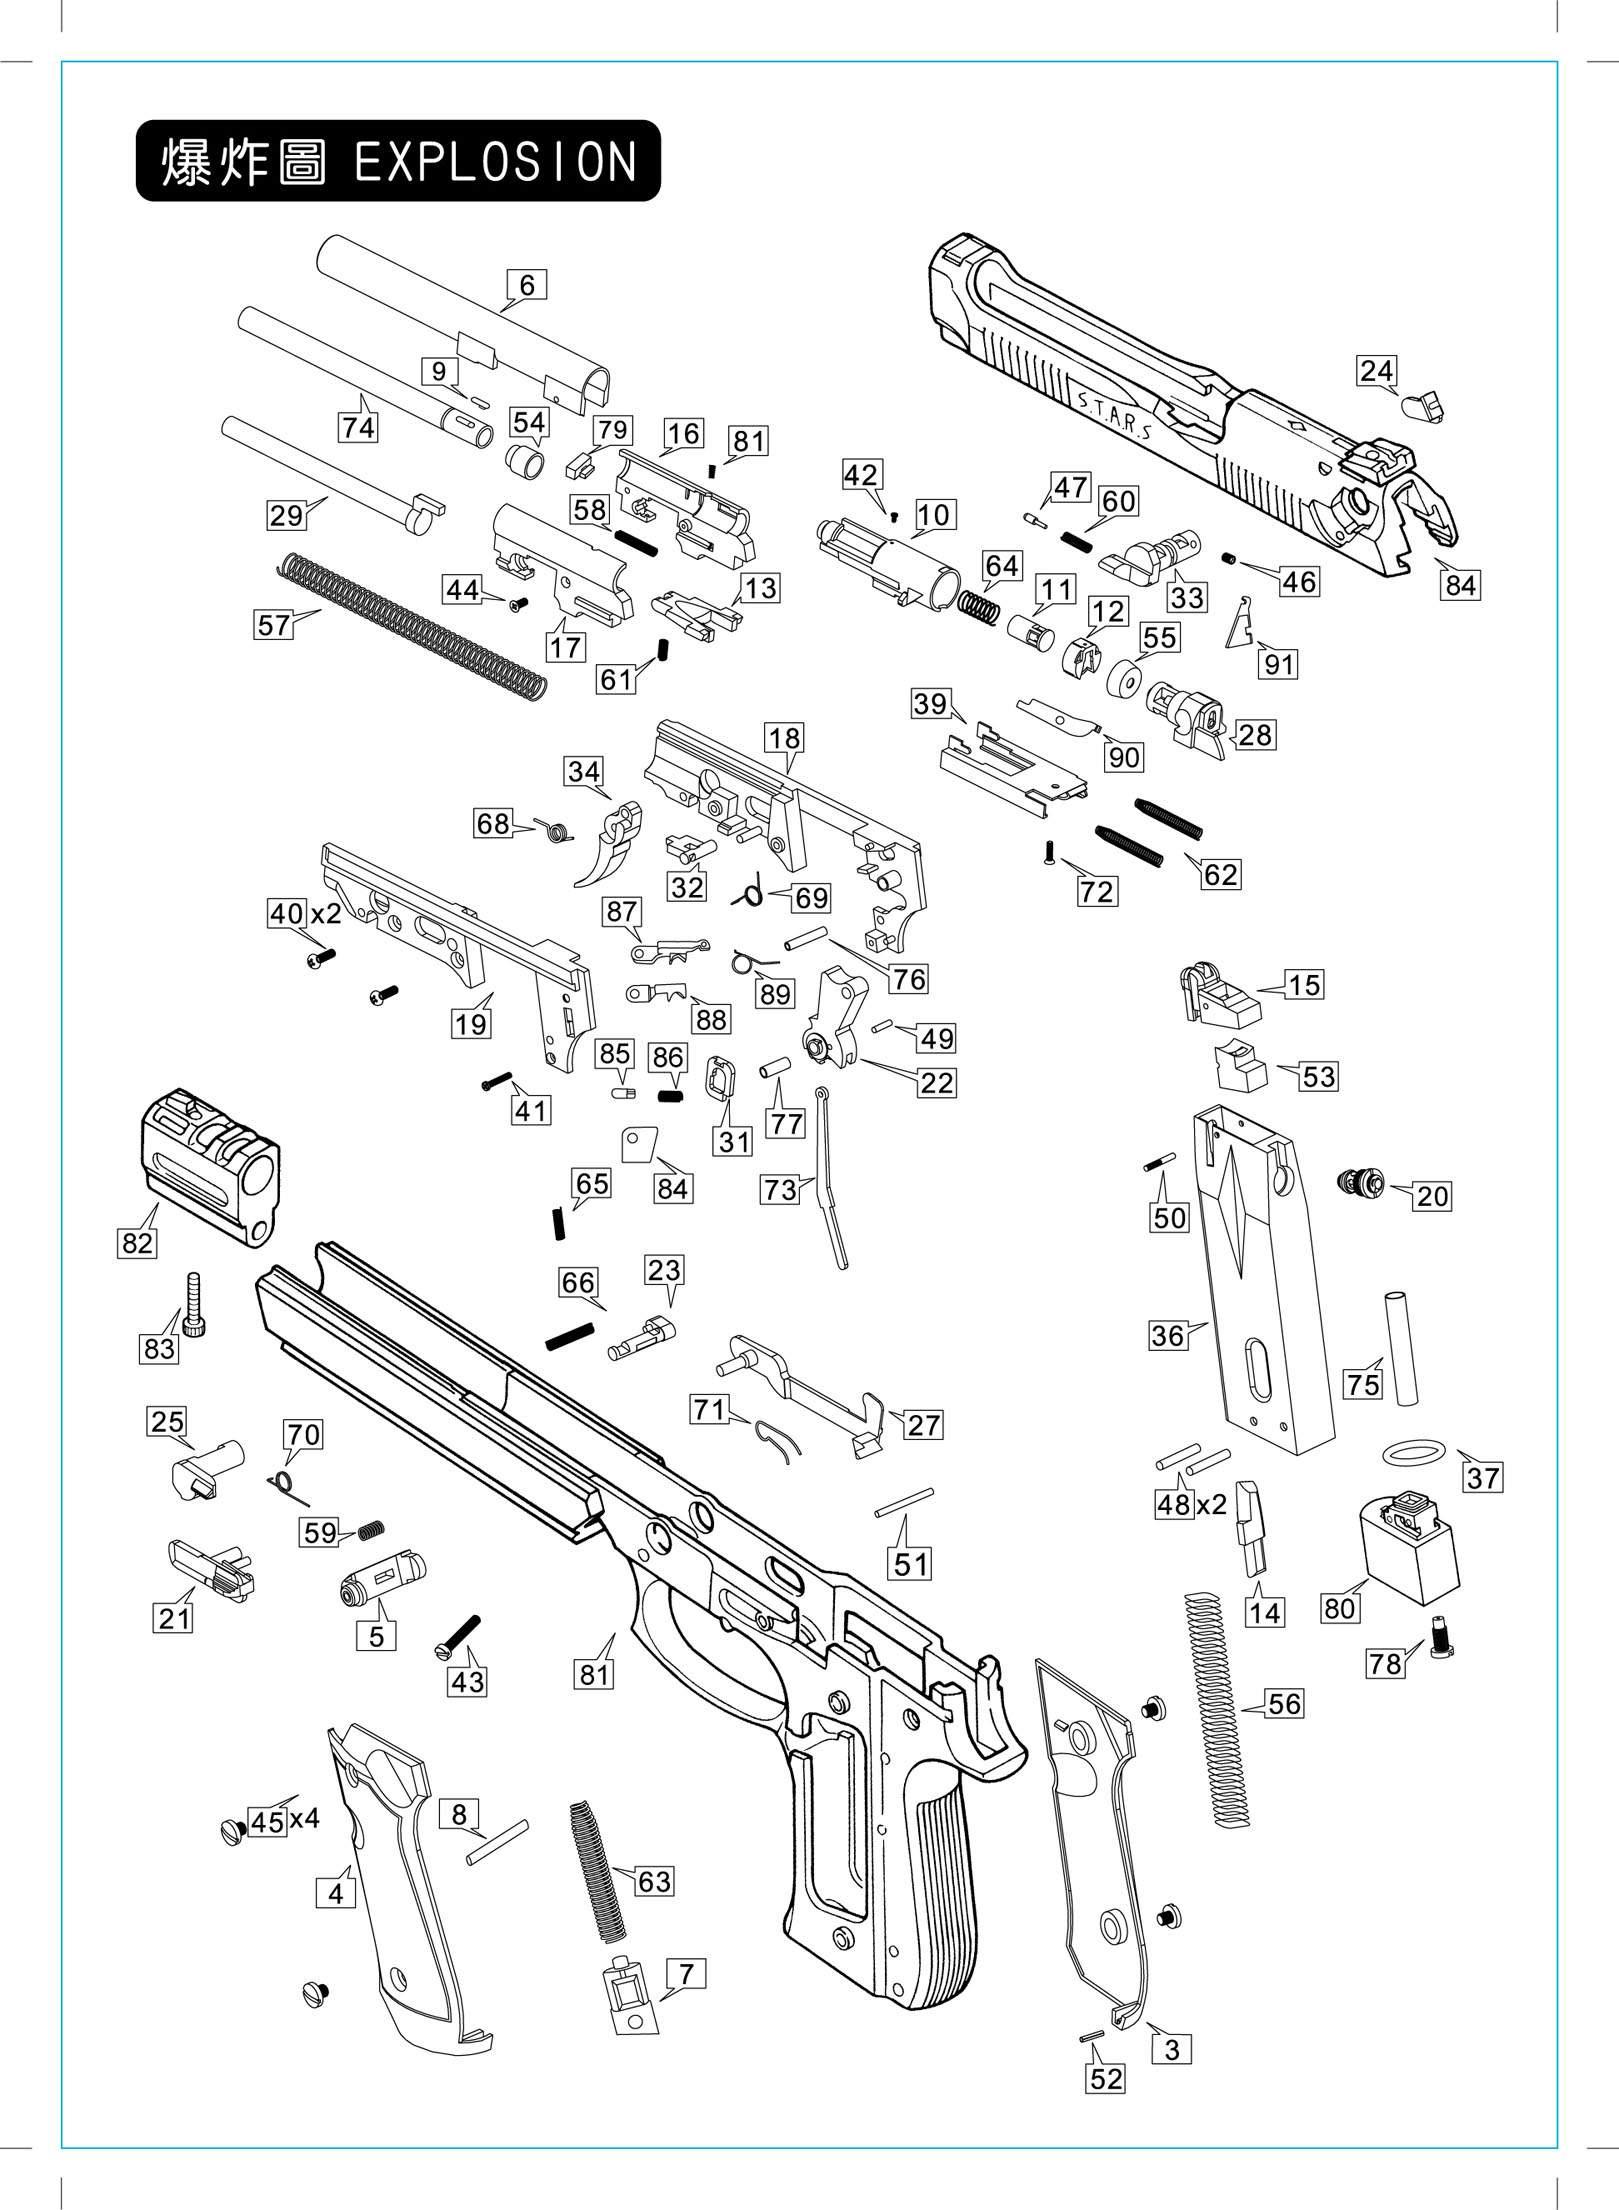 b2600i4x4frontaxlediagramgif home wiring diagrams Auto Electrical Wiring Diagram Mercedez SLK 230 2000